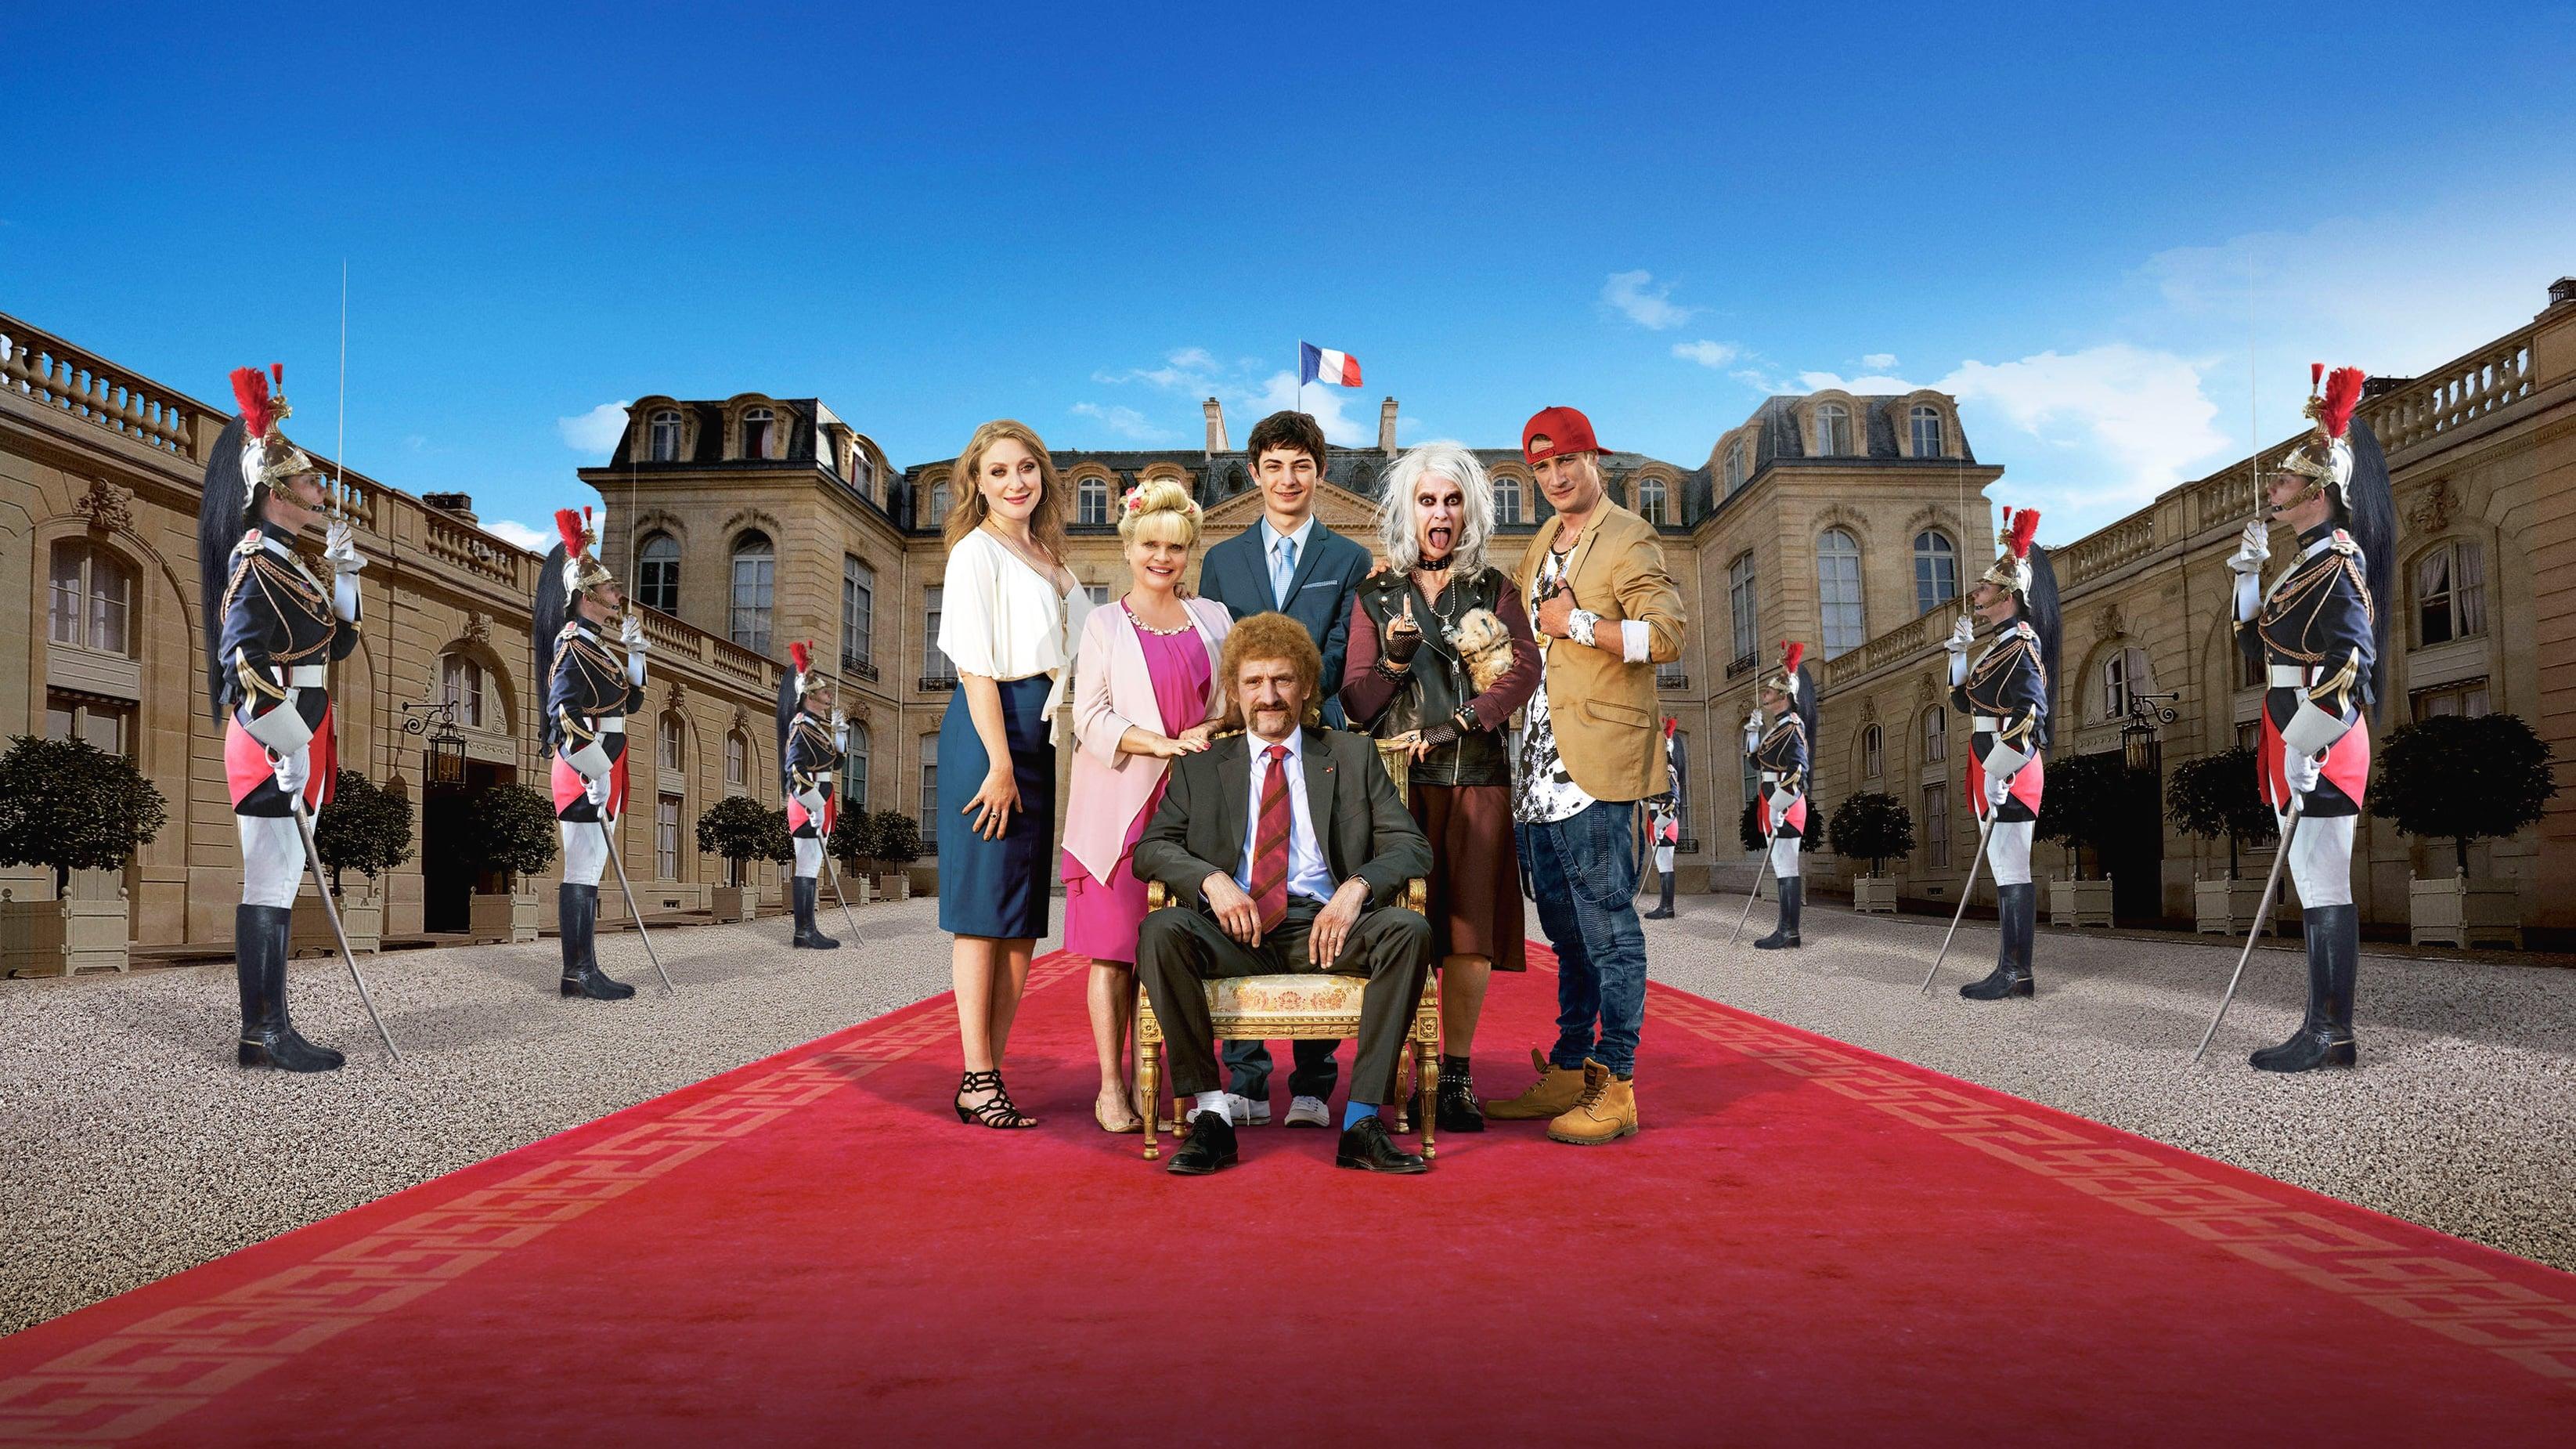 Watch Les Tuche 3 (2018) Full Movie at sectormovie.com